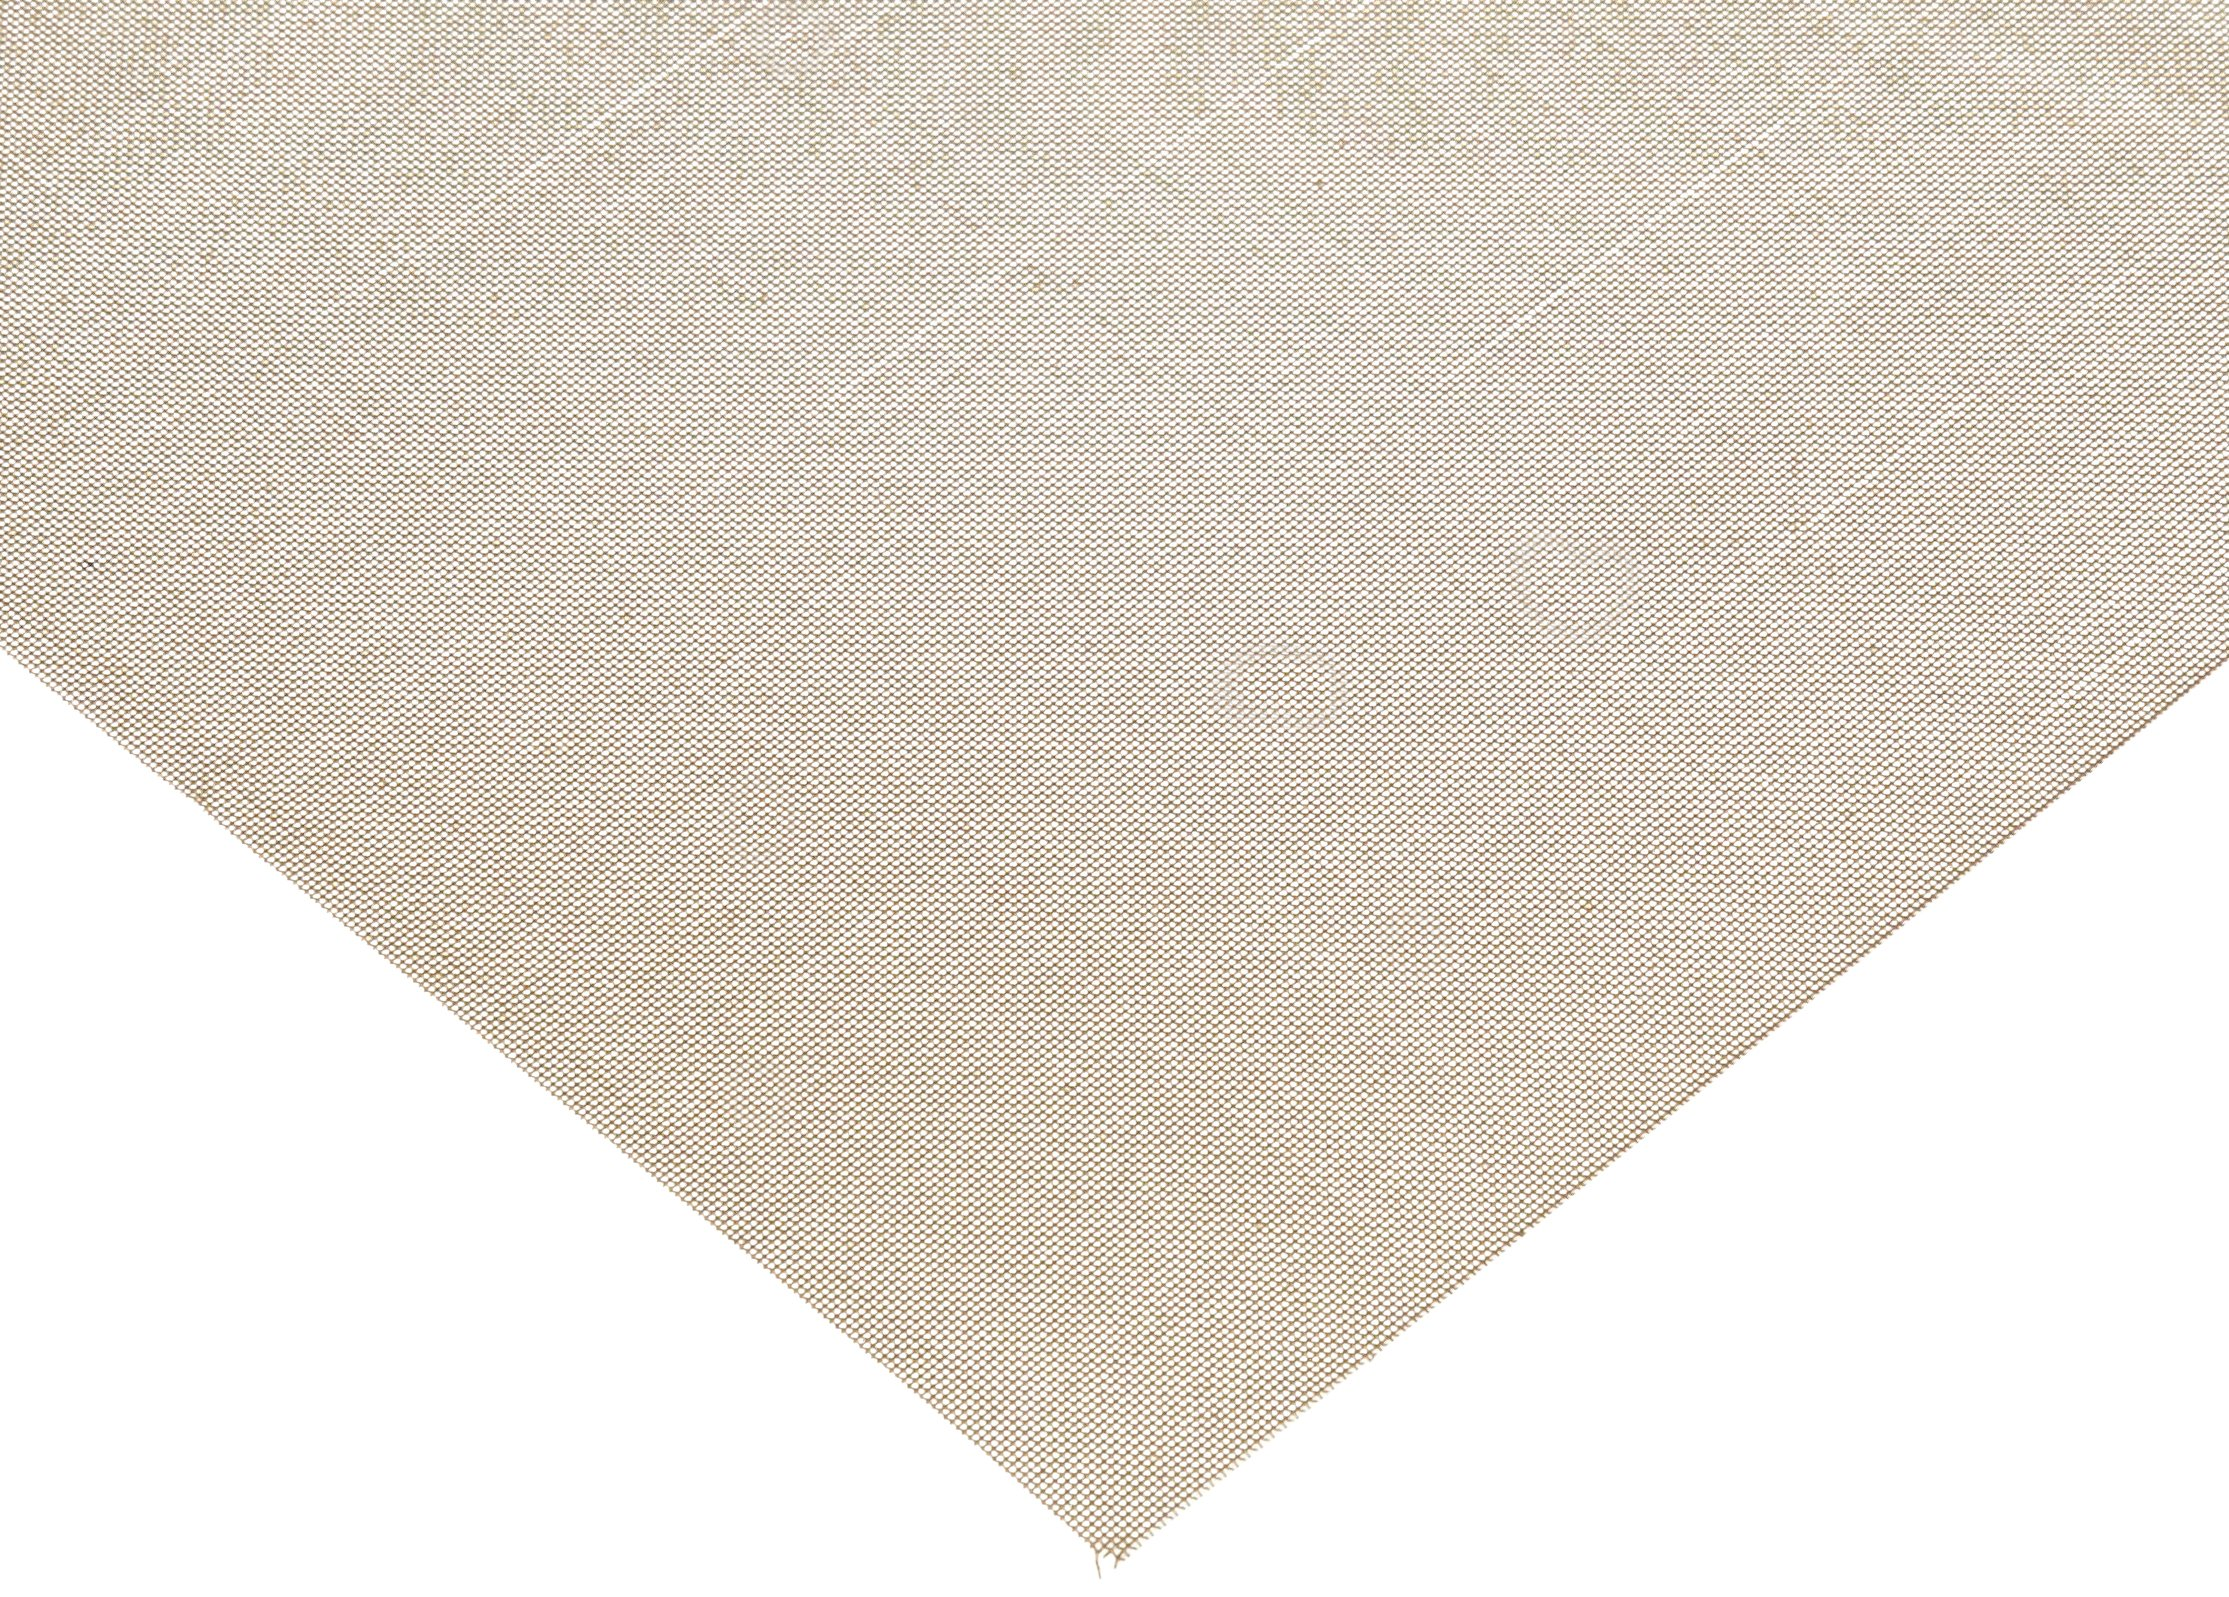 Brass Woven Mesh Sheet, Unpolished (Mill) Finish, ASTM E2016-06, 12'' Width, 24'' Length, 0.0045'' Wire Diameter, 30% Open Area